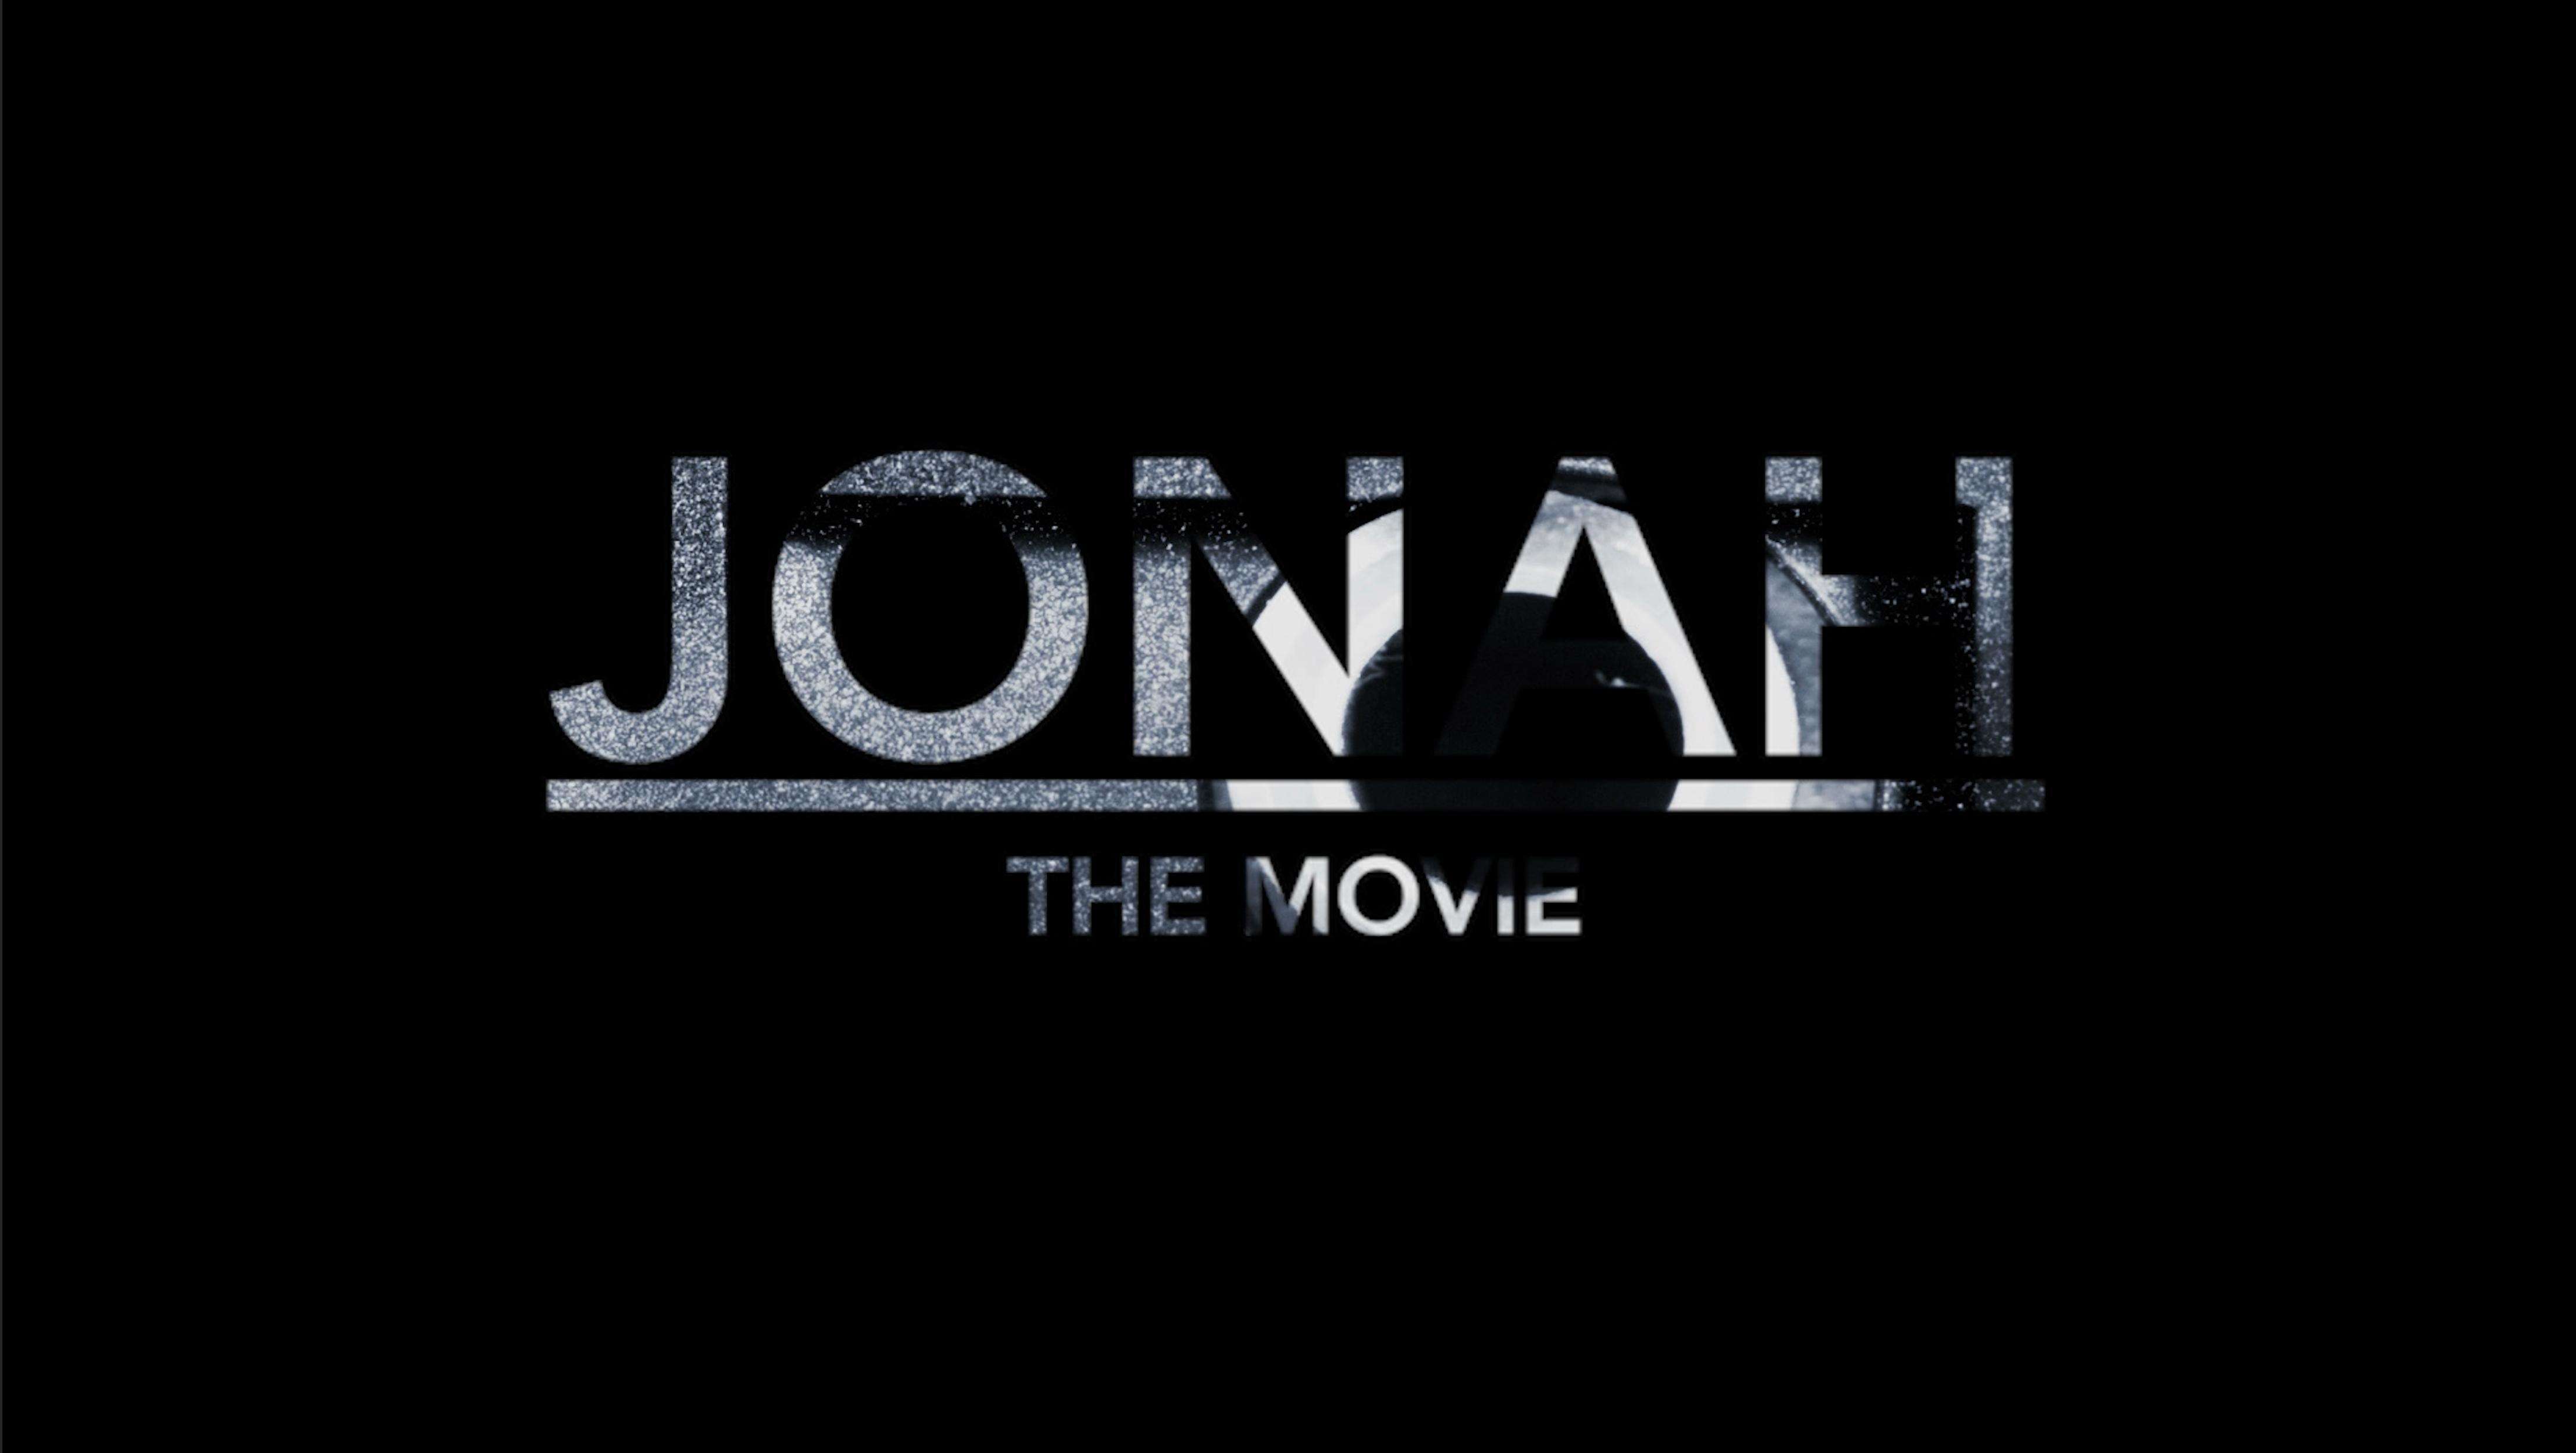 The Jonah